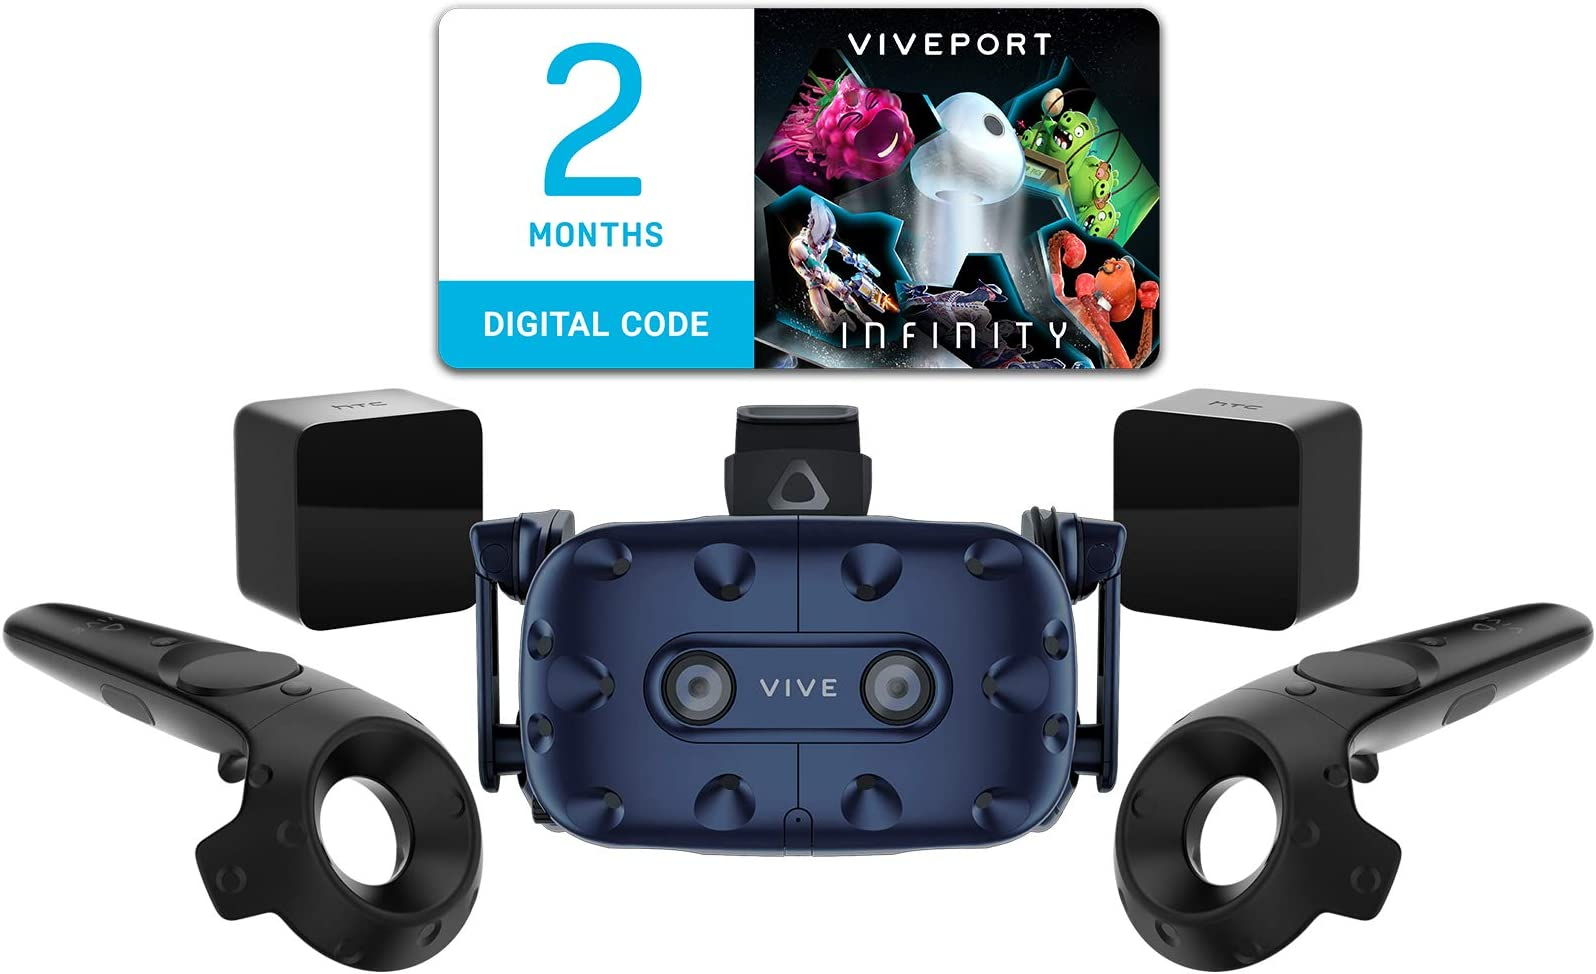 be032b9c3f52 Amazon.com  HTC Virtual Reality System Vive Pro Starter Kit - PC ...